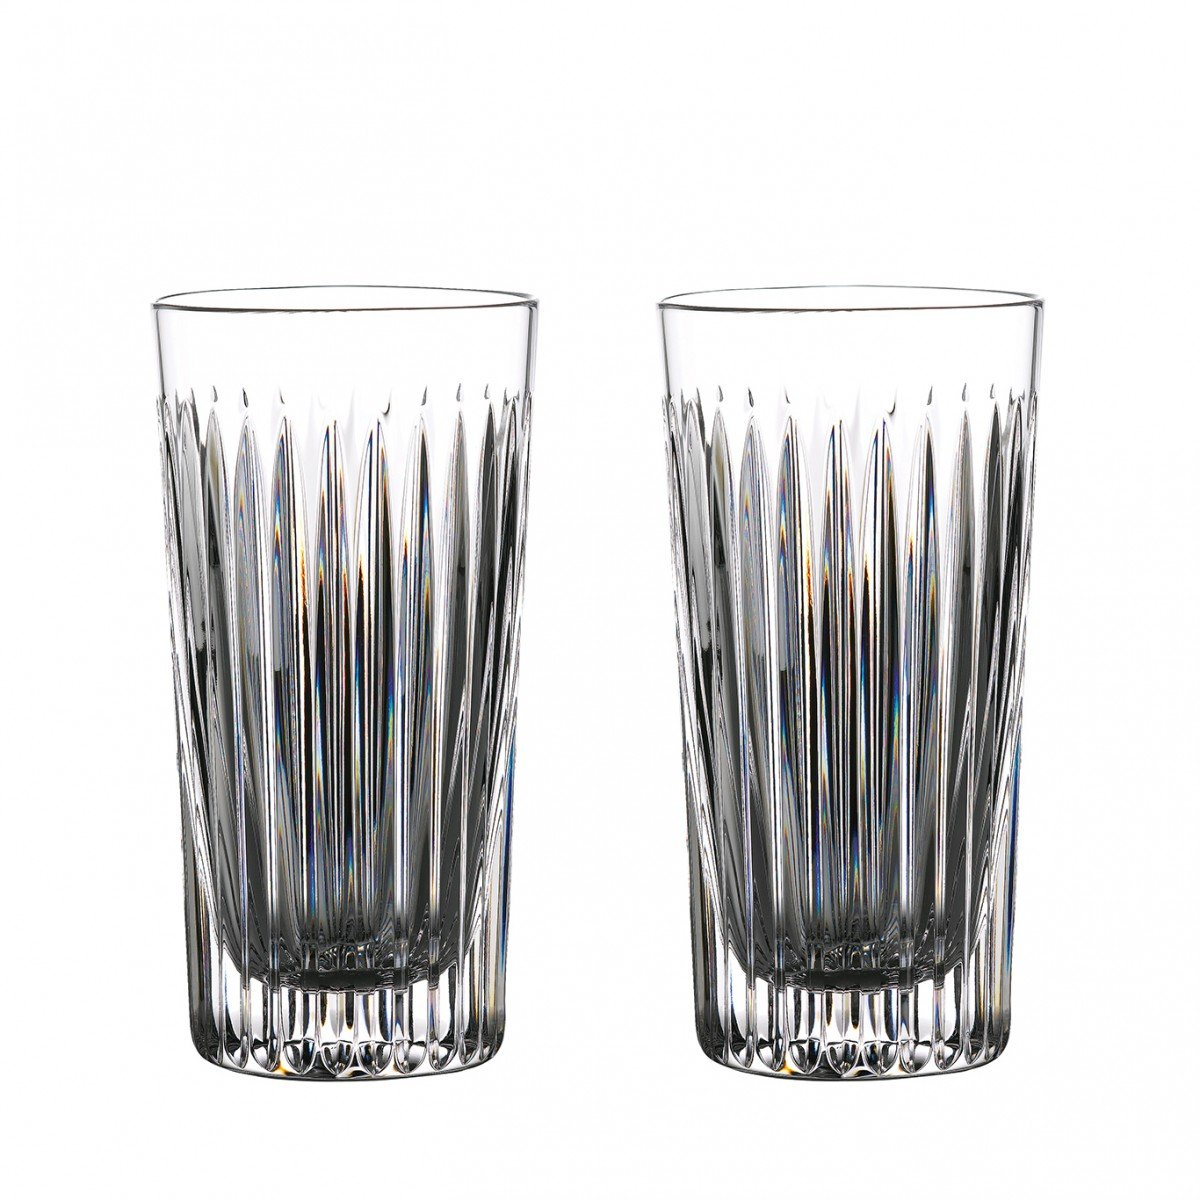 Waterford Crystal Gin Journeys Aras Hiball, Pair